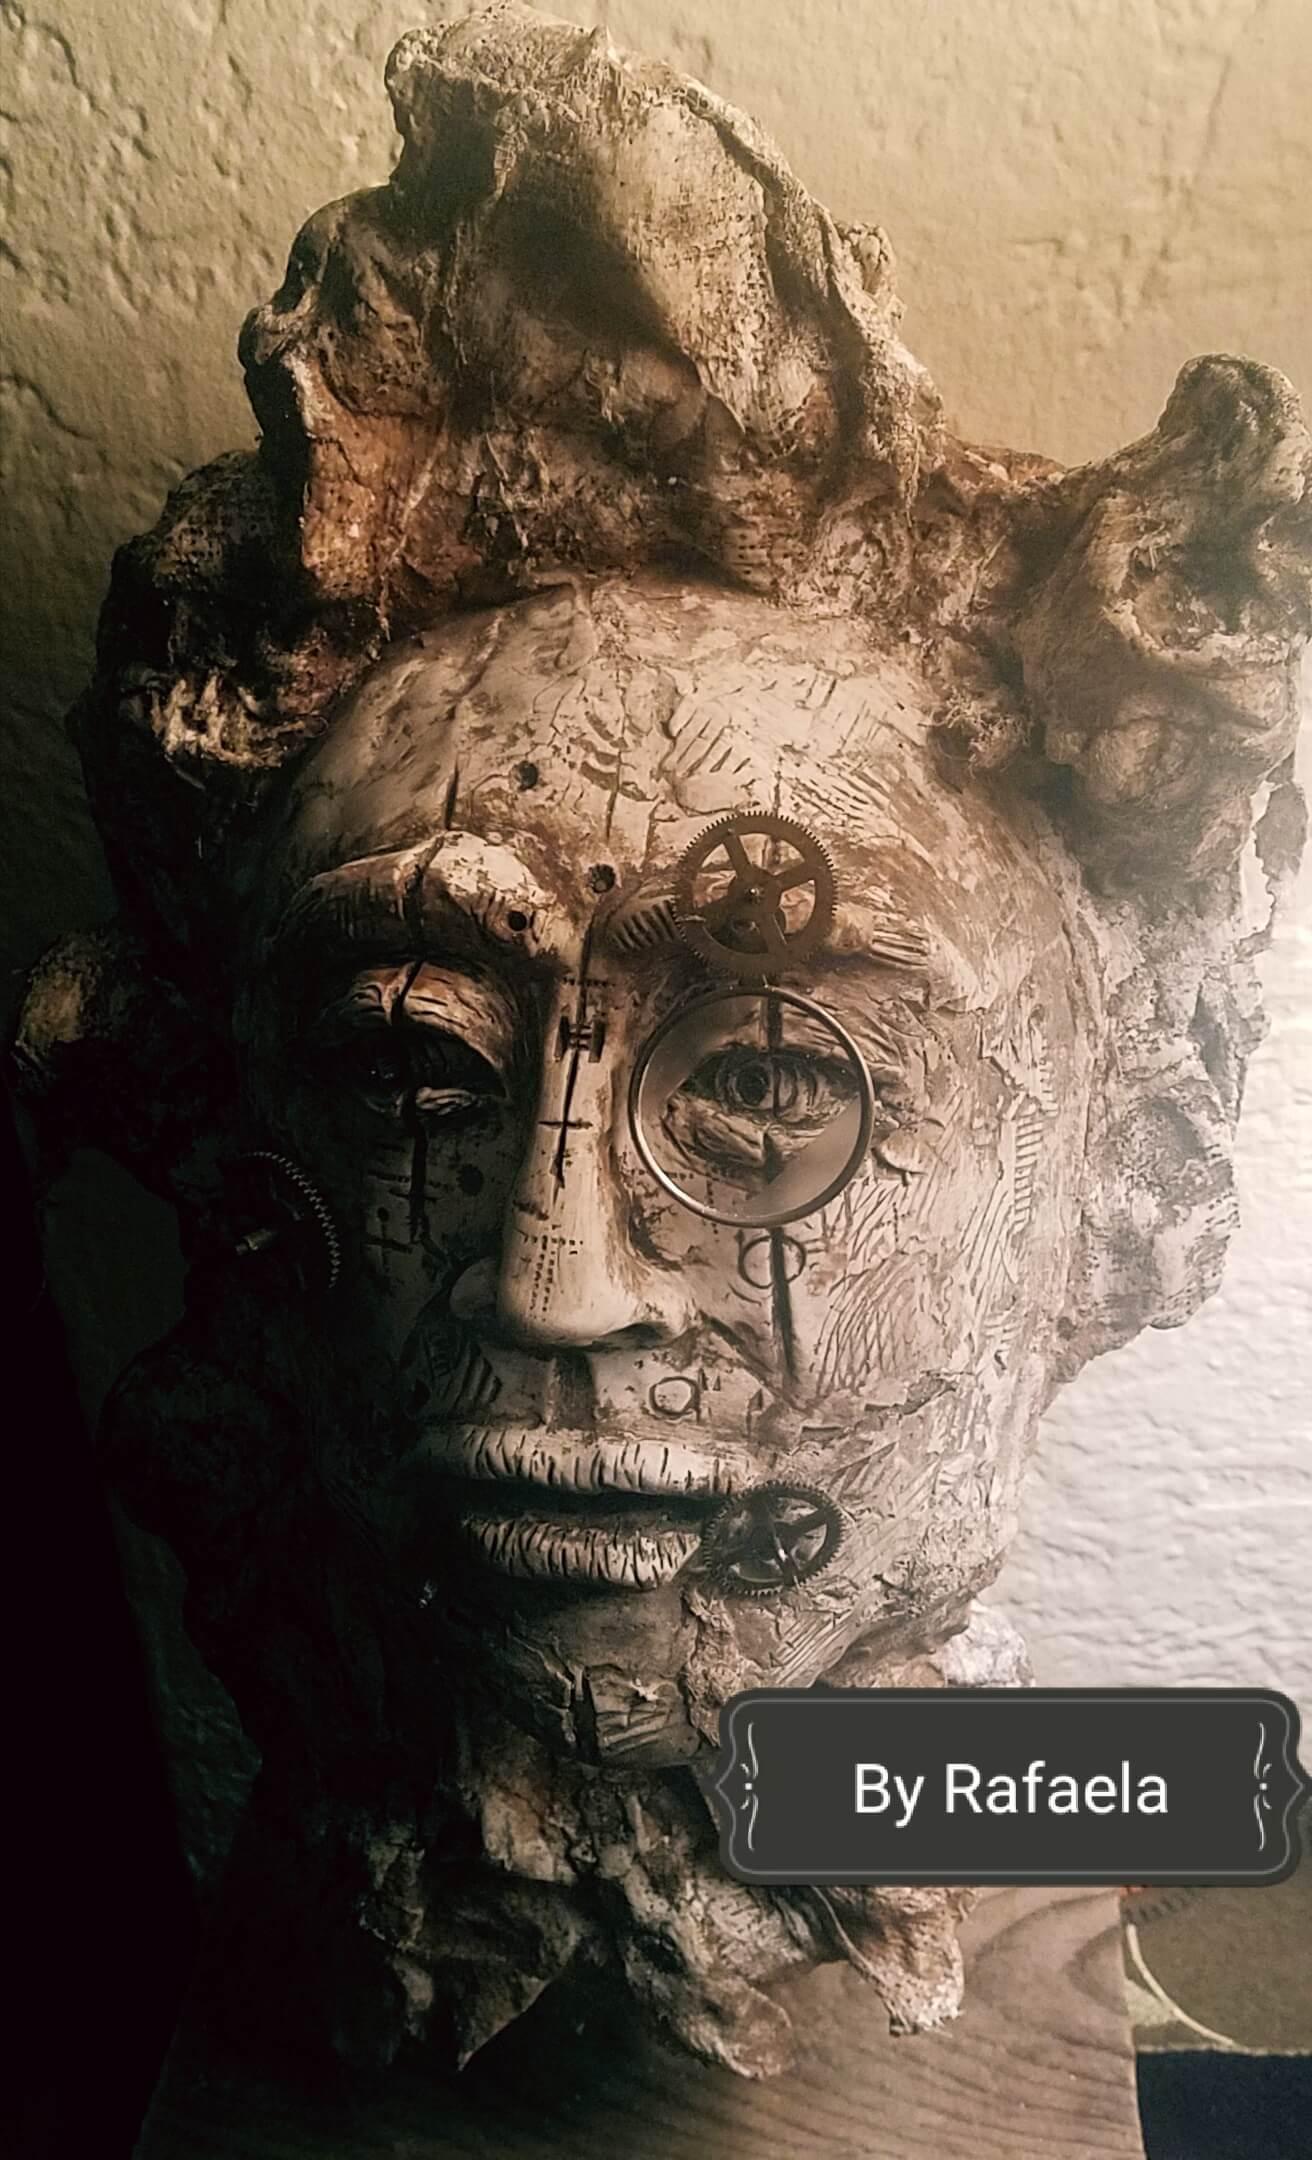 Rafaela Wickstrum clay artist figure 1